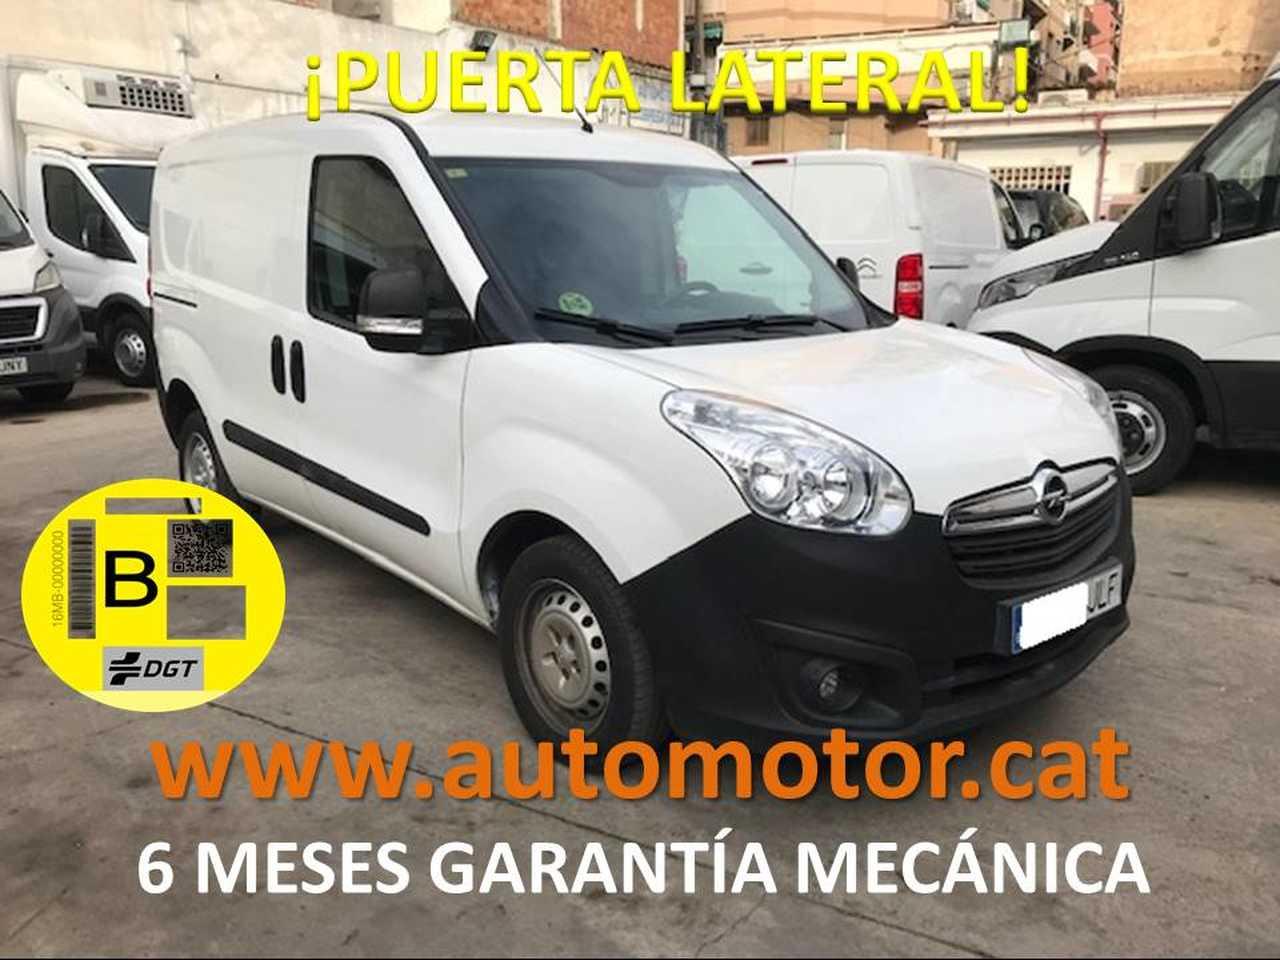 Opel Combo Furgon 1.3CDTI Cargo L1H1 90 - GARANTIA MECANICA  - Foto 1